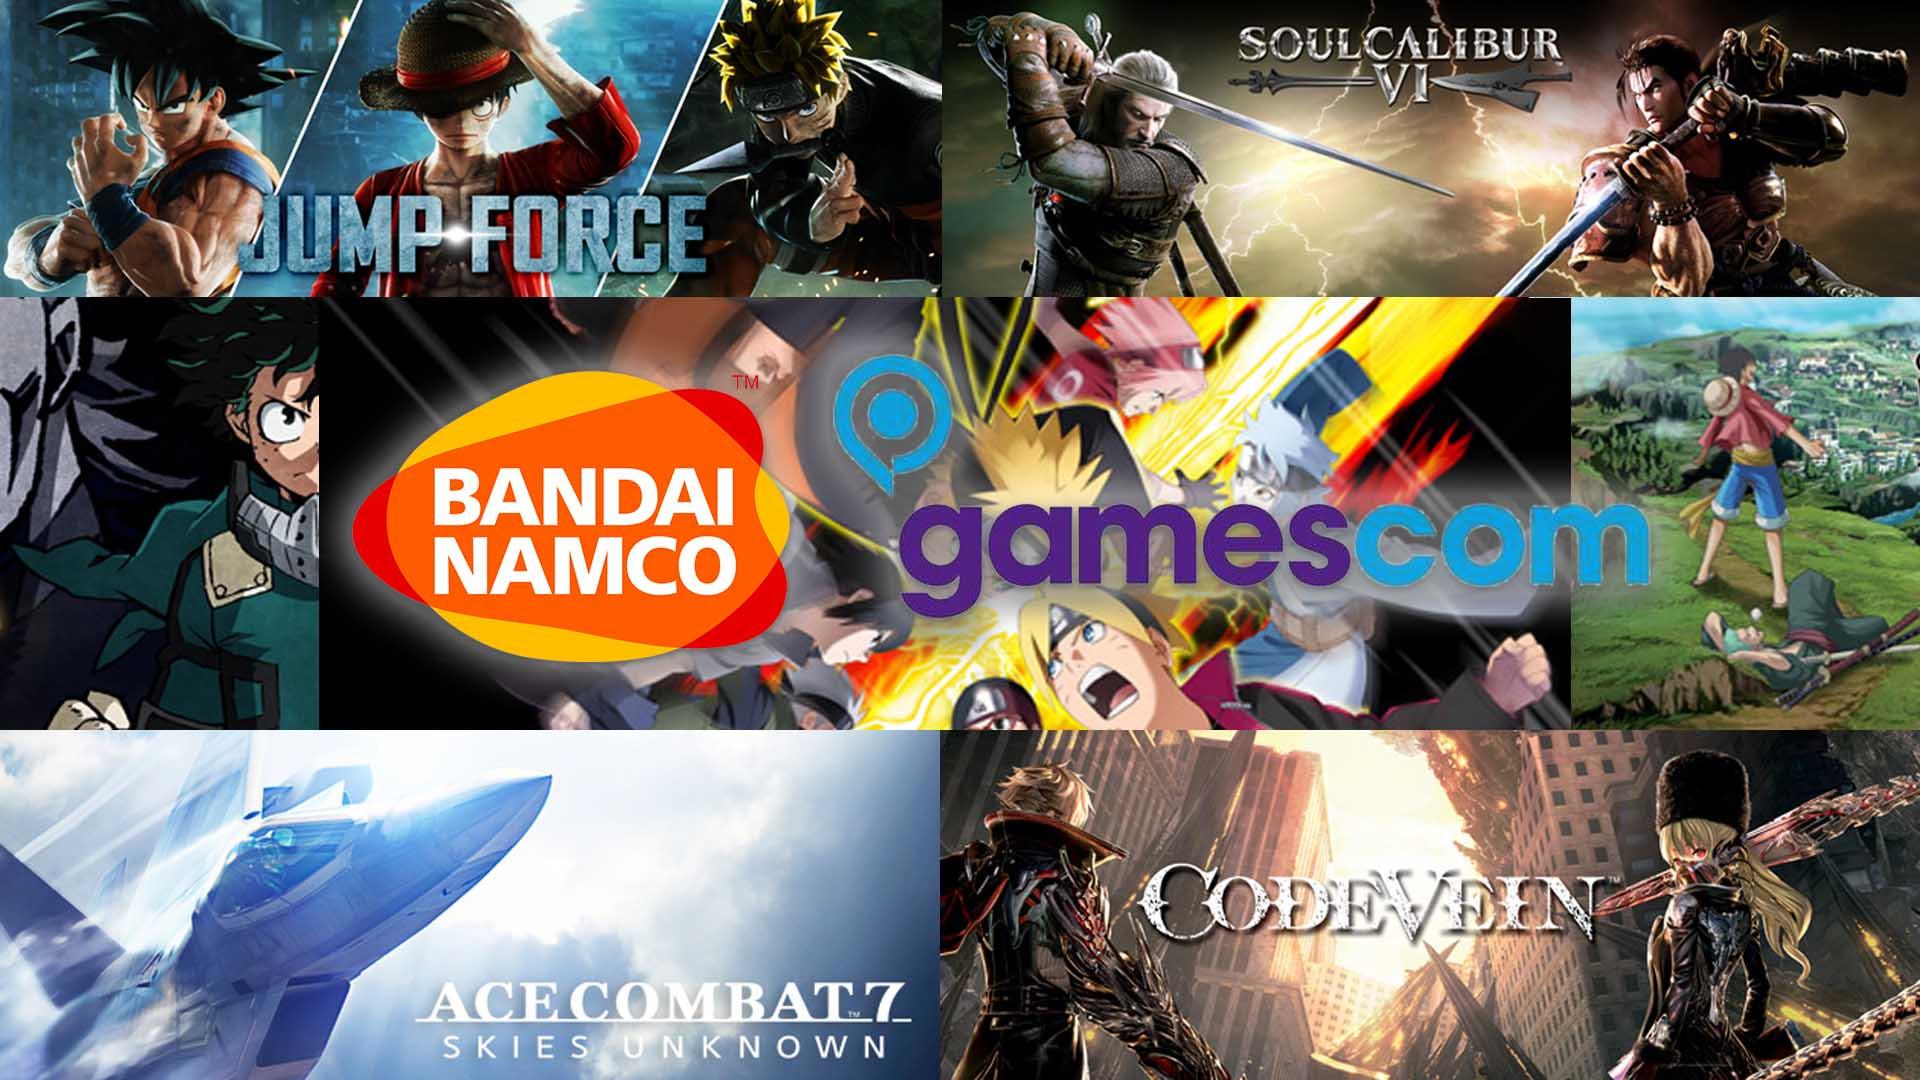 DLC gratis @Bandai Namco : Ni no Kuni II, Dark Souls, Dragon Ball y otros